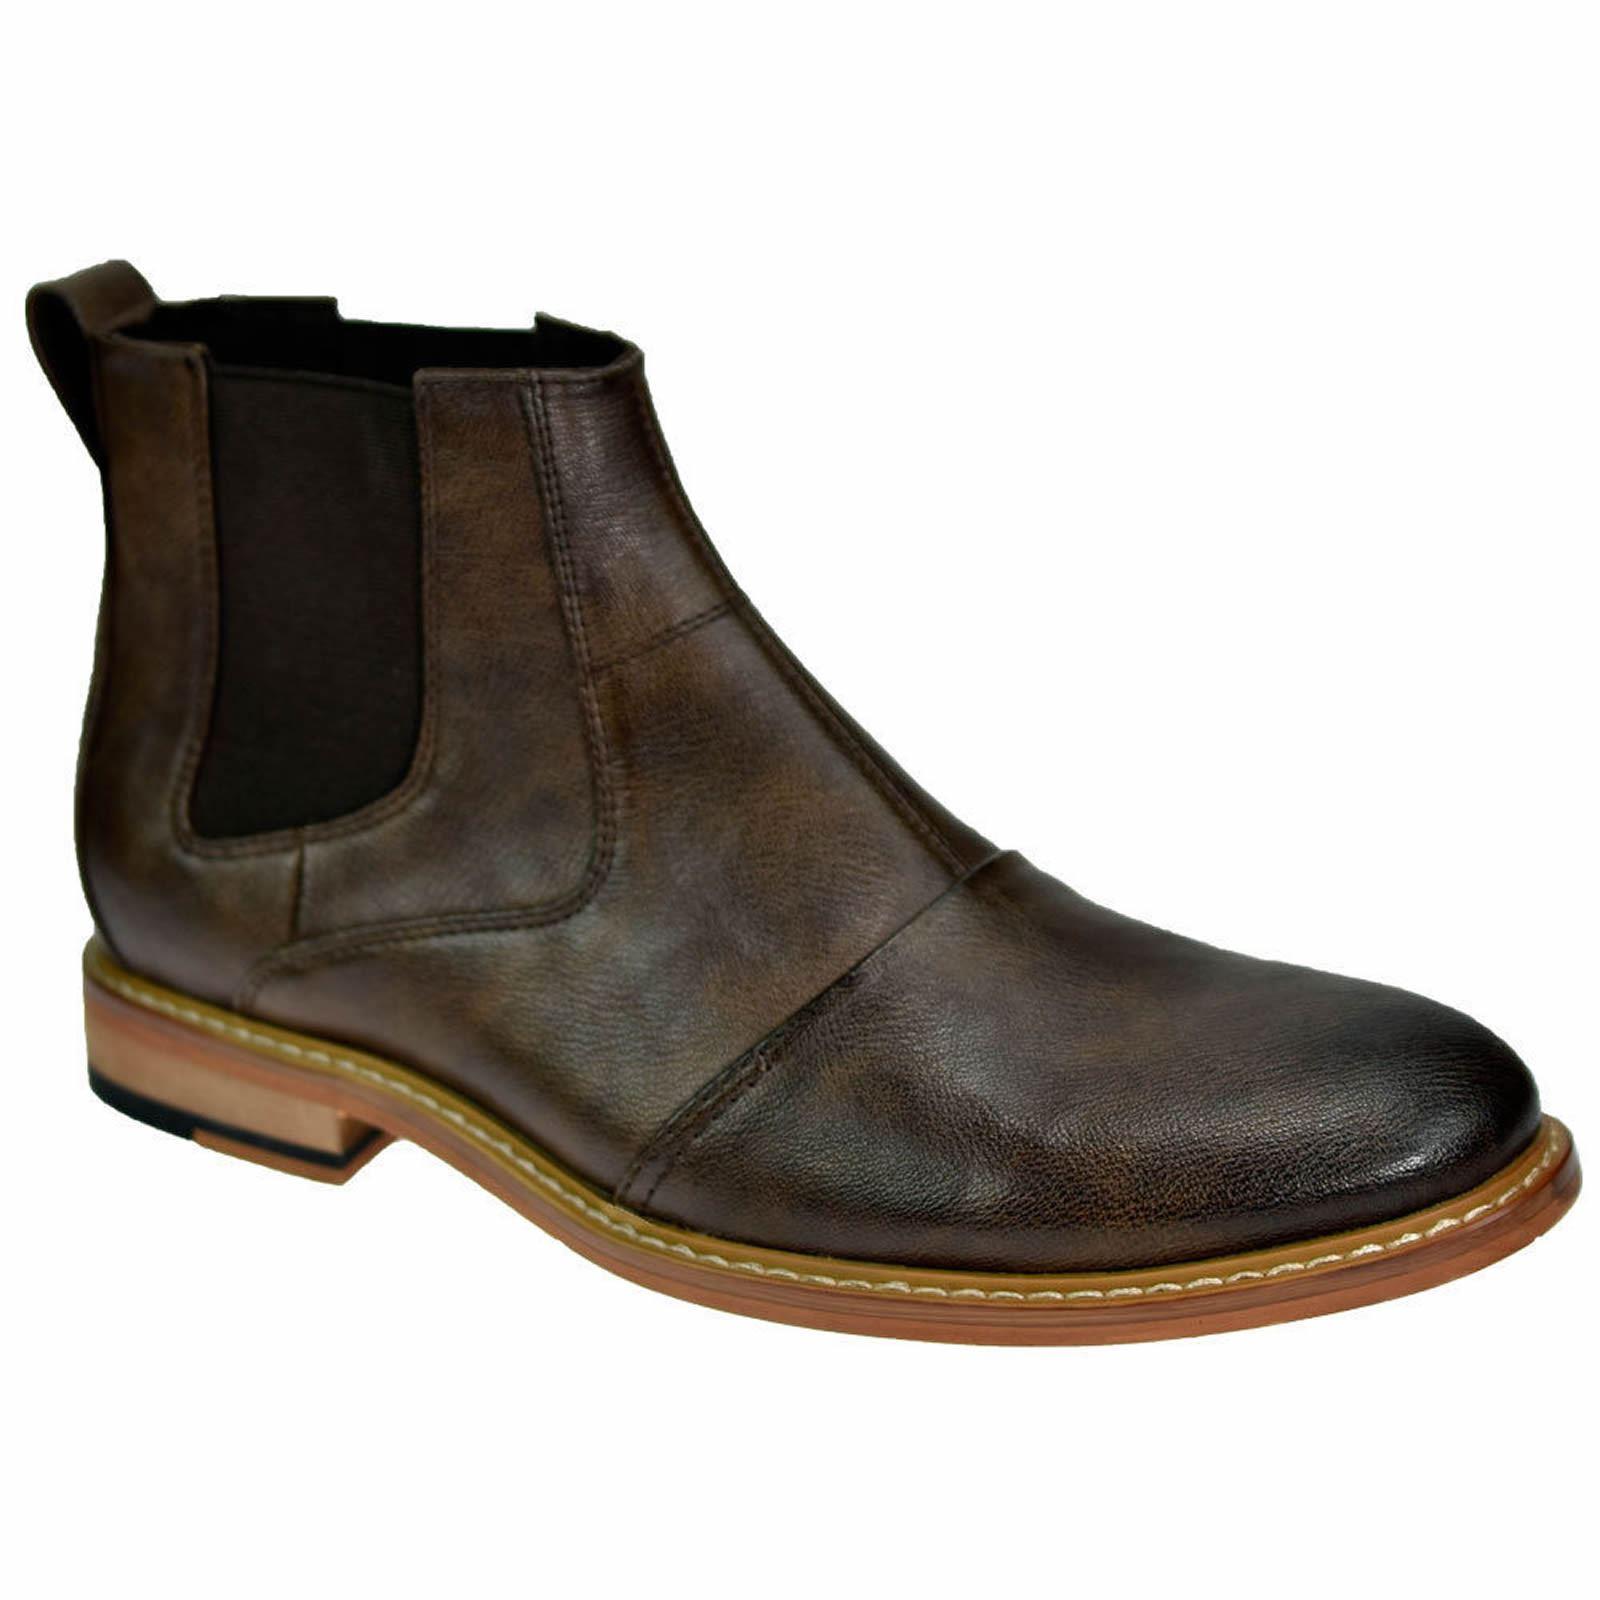 mens chelsea boots cavani simon leather look slip on